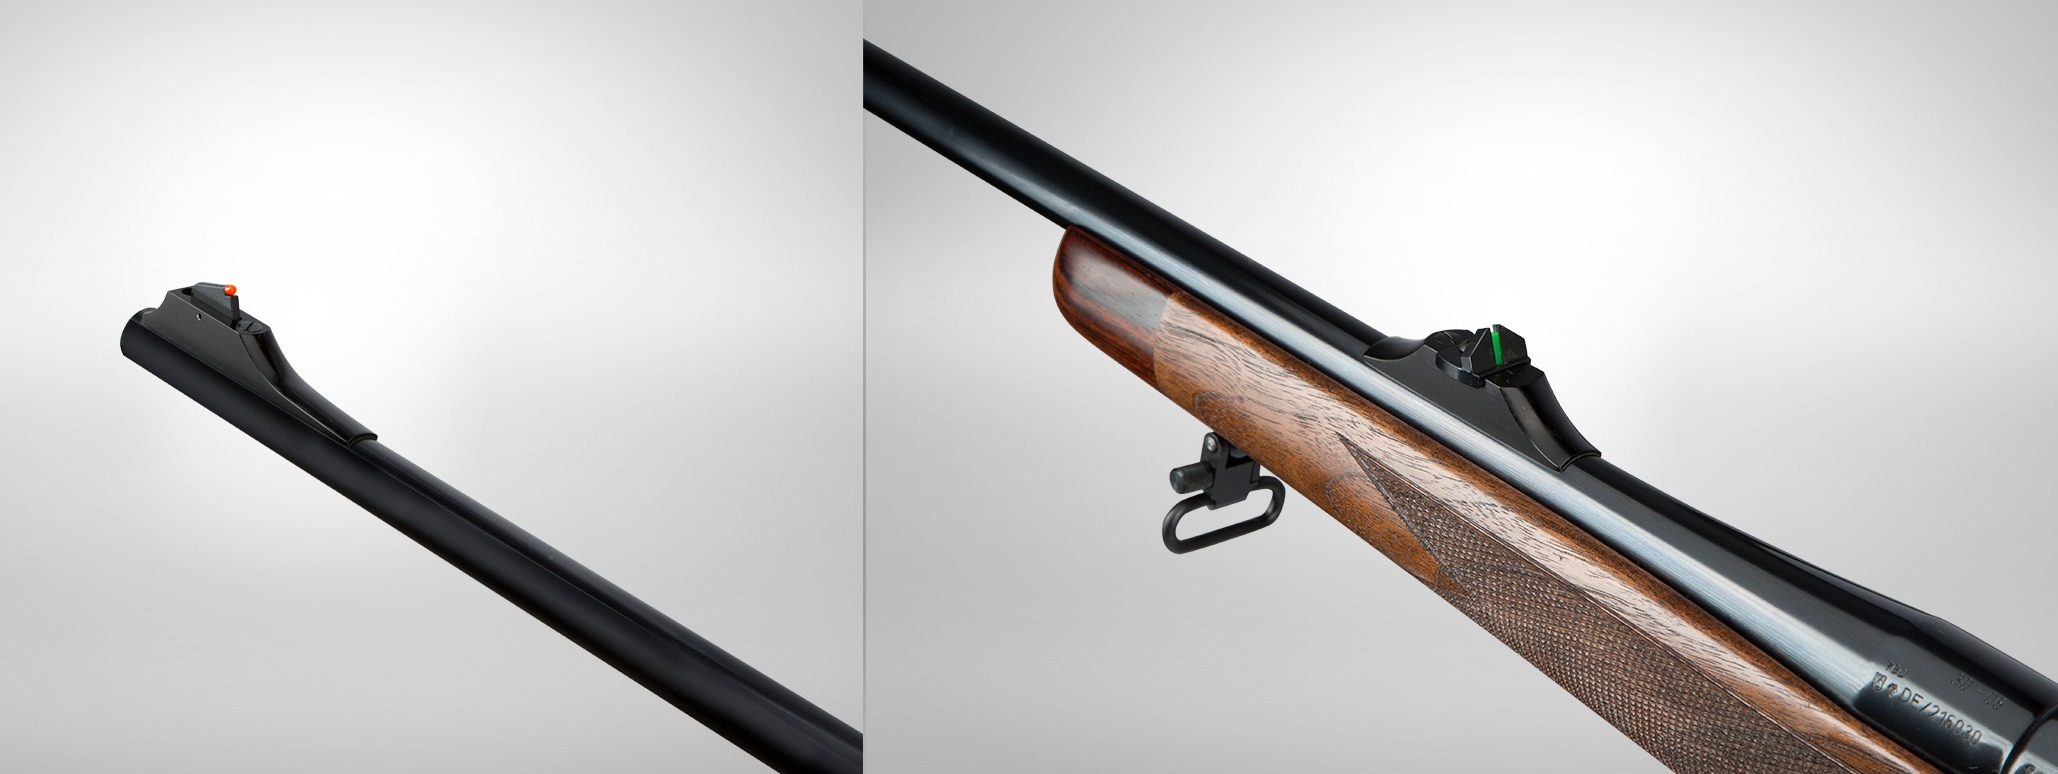 Heym SR21 sporting rifle optic fiber open sights